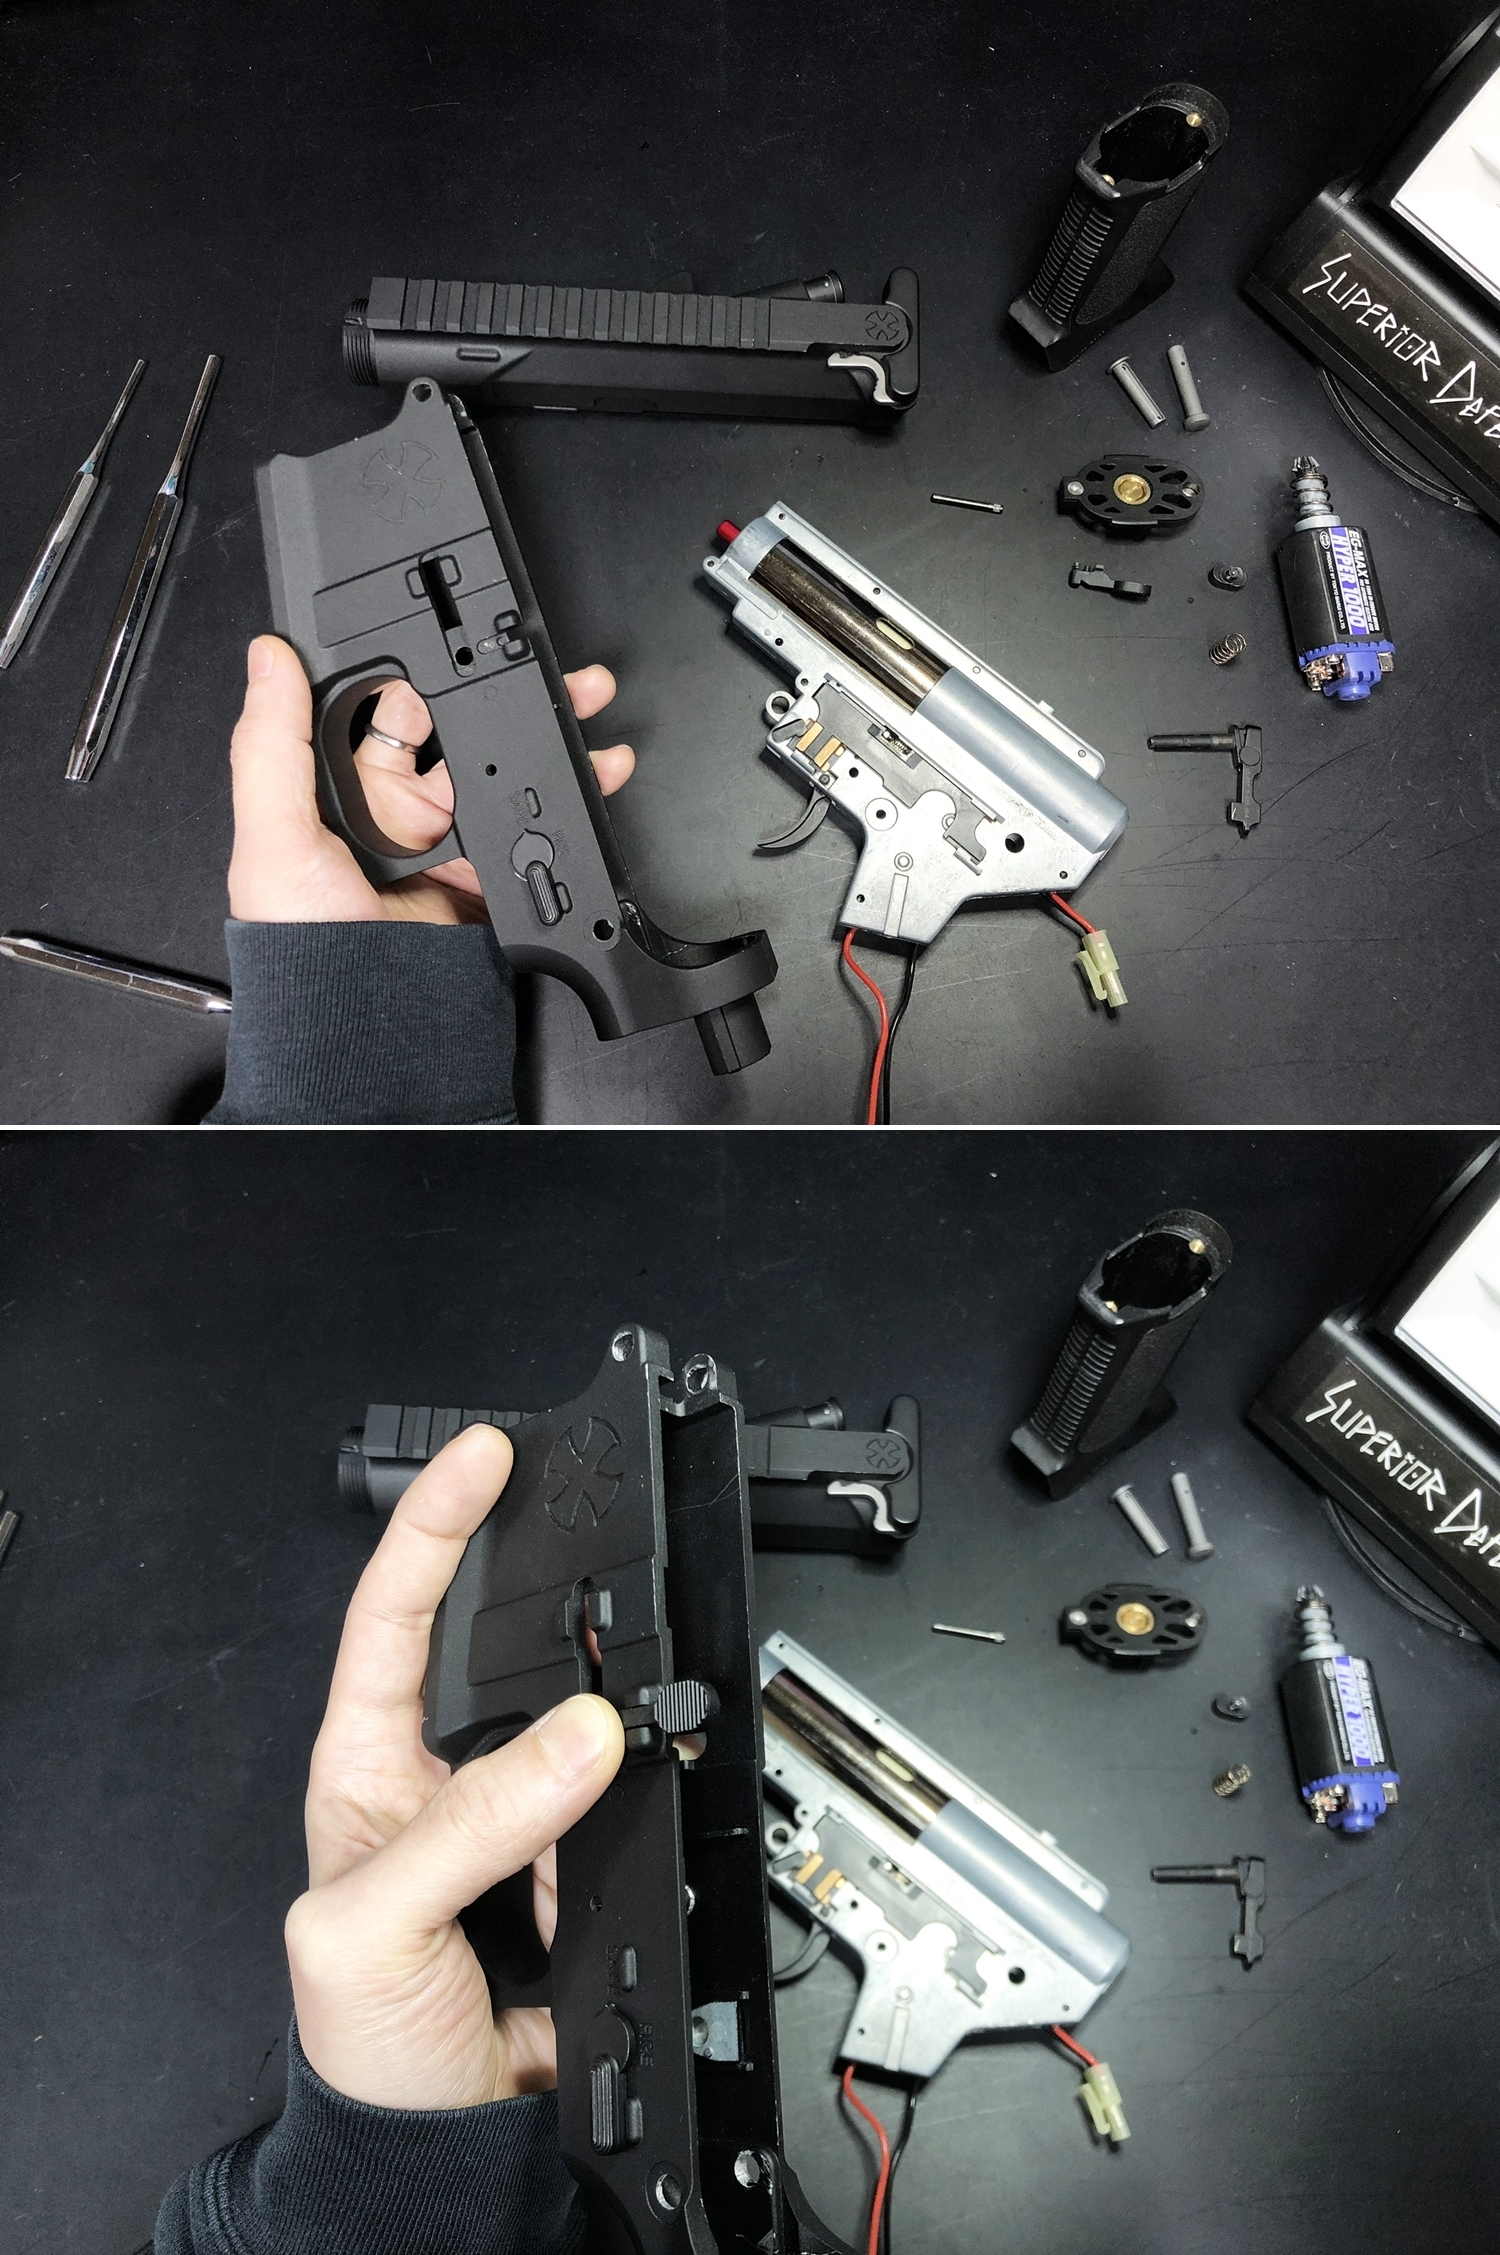 19 NOVESKE GEN3 N4 BY MADBULL!! 『第一弾』 新たにSTD民間系ARを作り始めたいと思います!! STD AR-15 M4 スタンダード 電動ガン マルイ ノベスケ ノベスキー マットブル メタルフレーム 動作テスト 組込 取付 カス